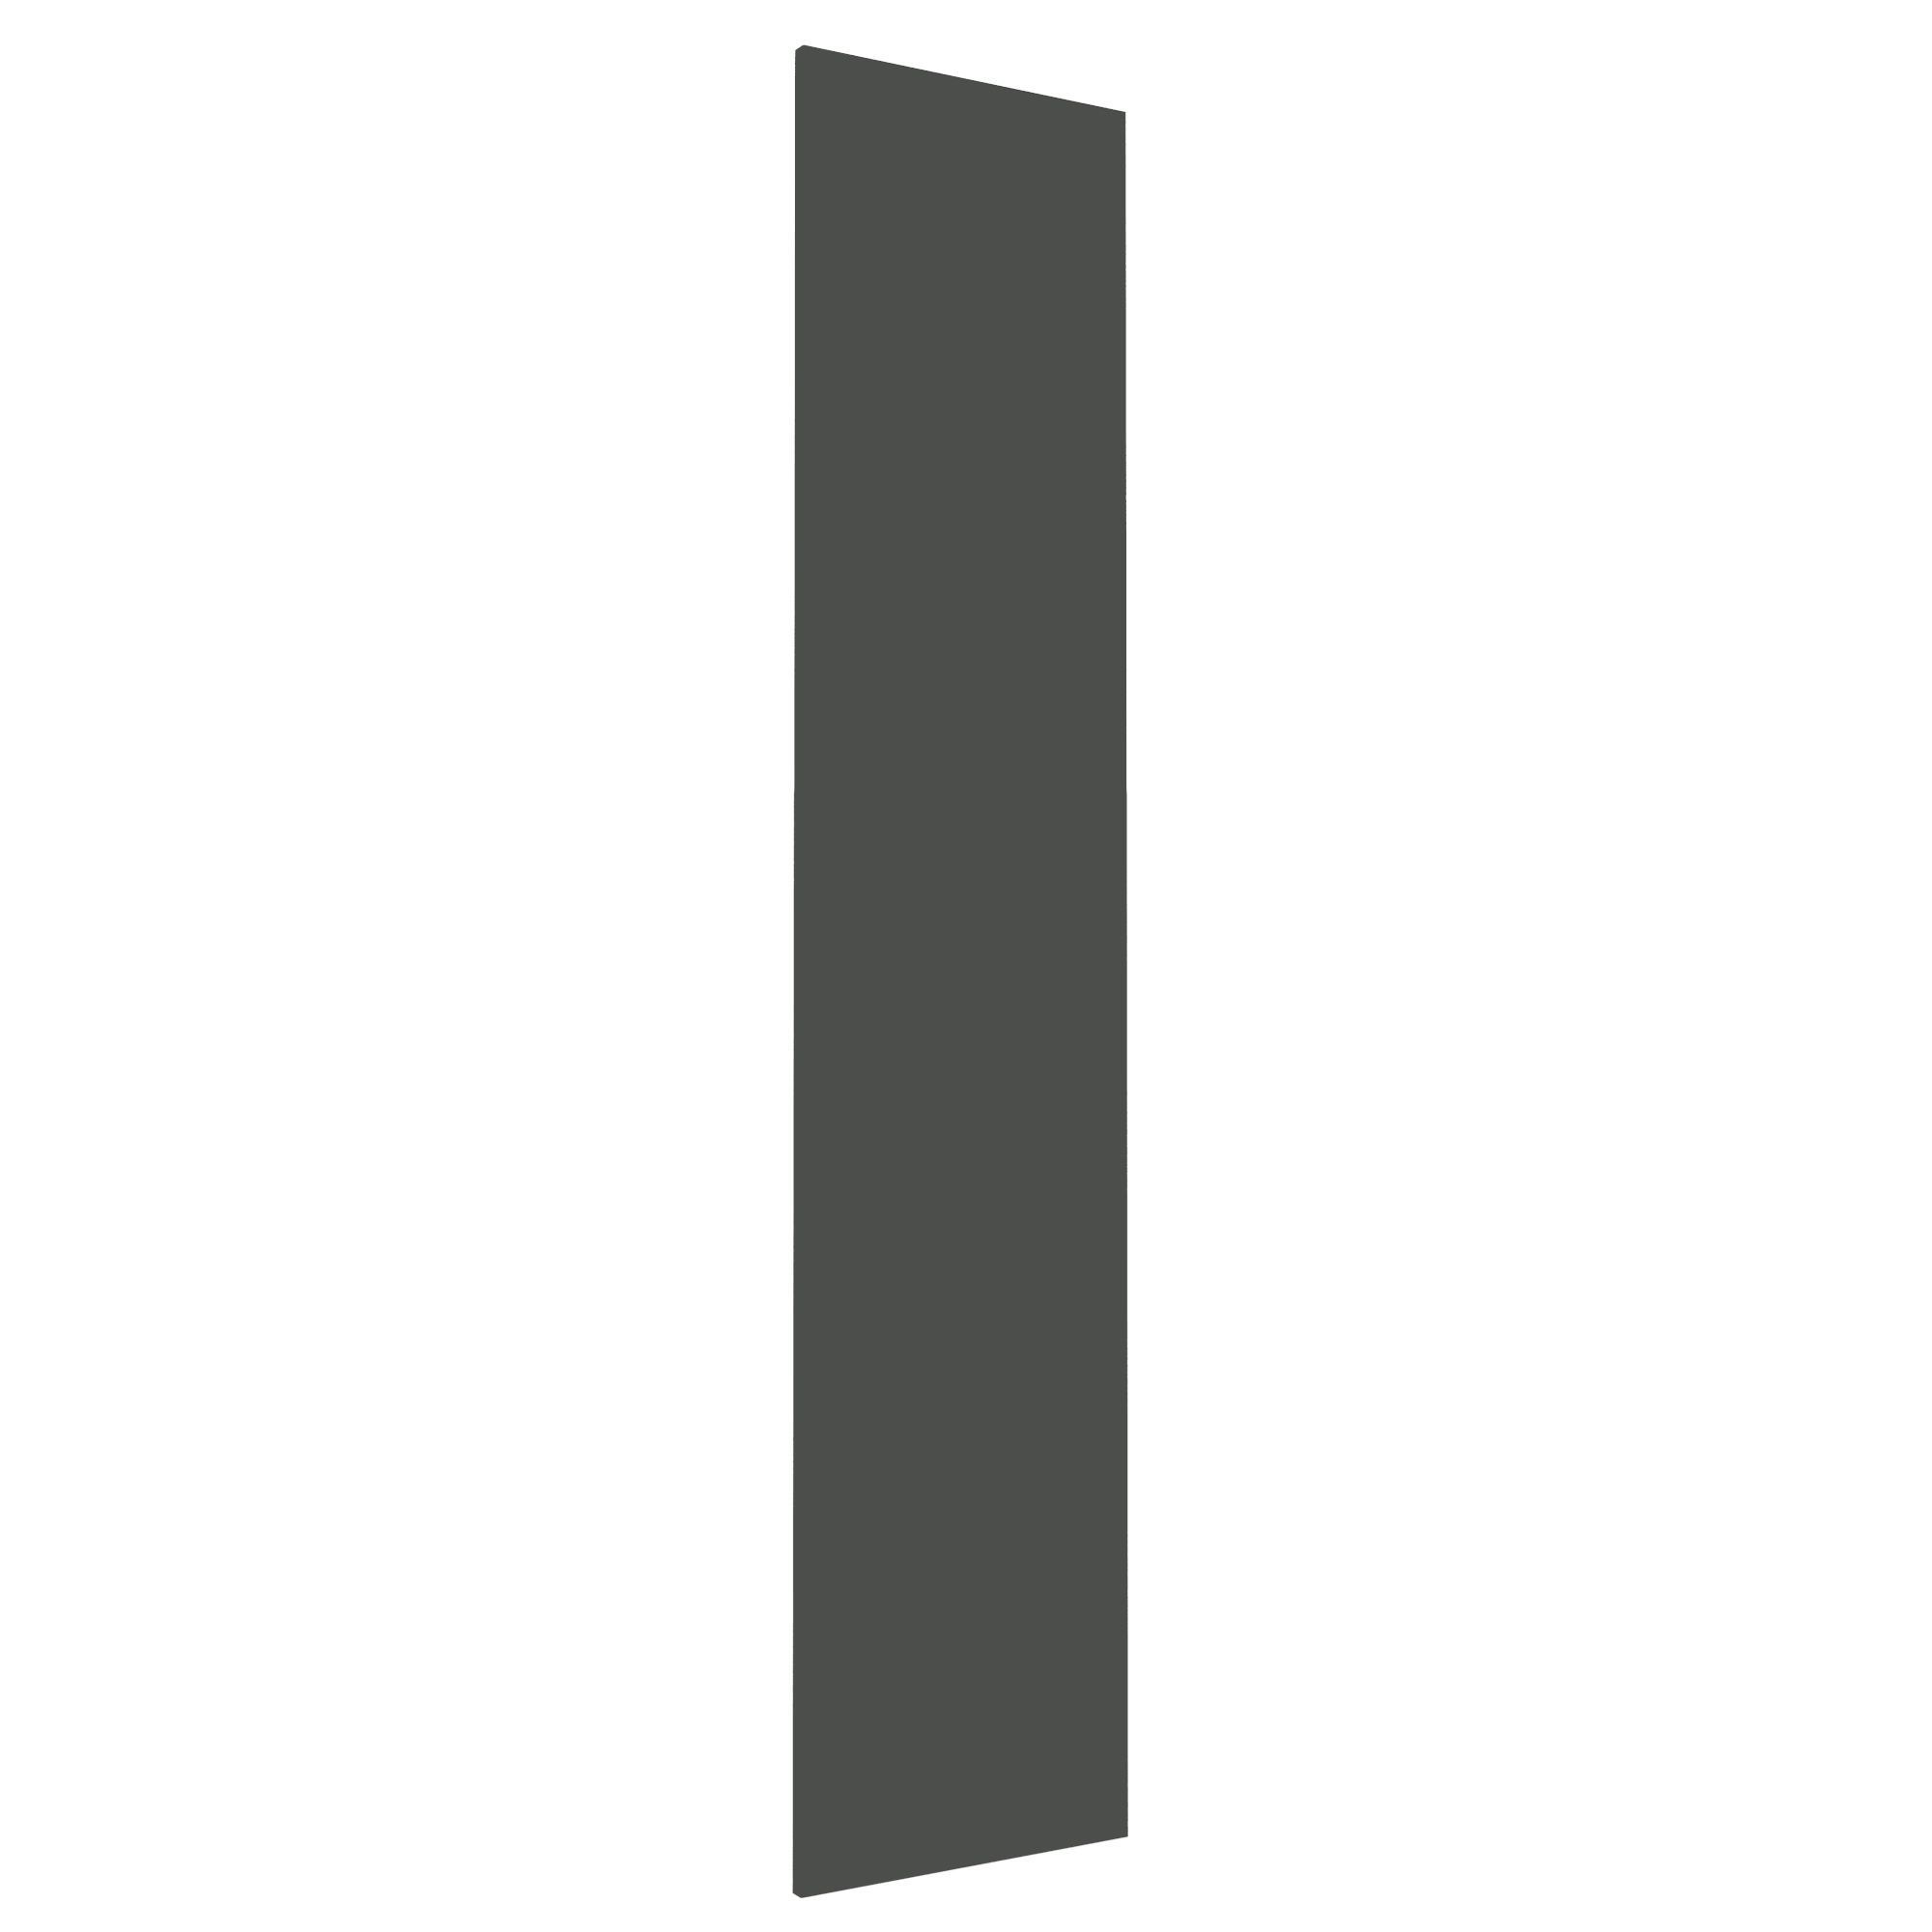 Darwin Modular Anthracite & Gloss Wardrobe Door (h)1936mm (w)372mm (d)16mm